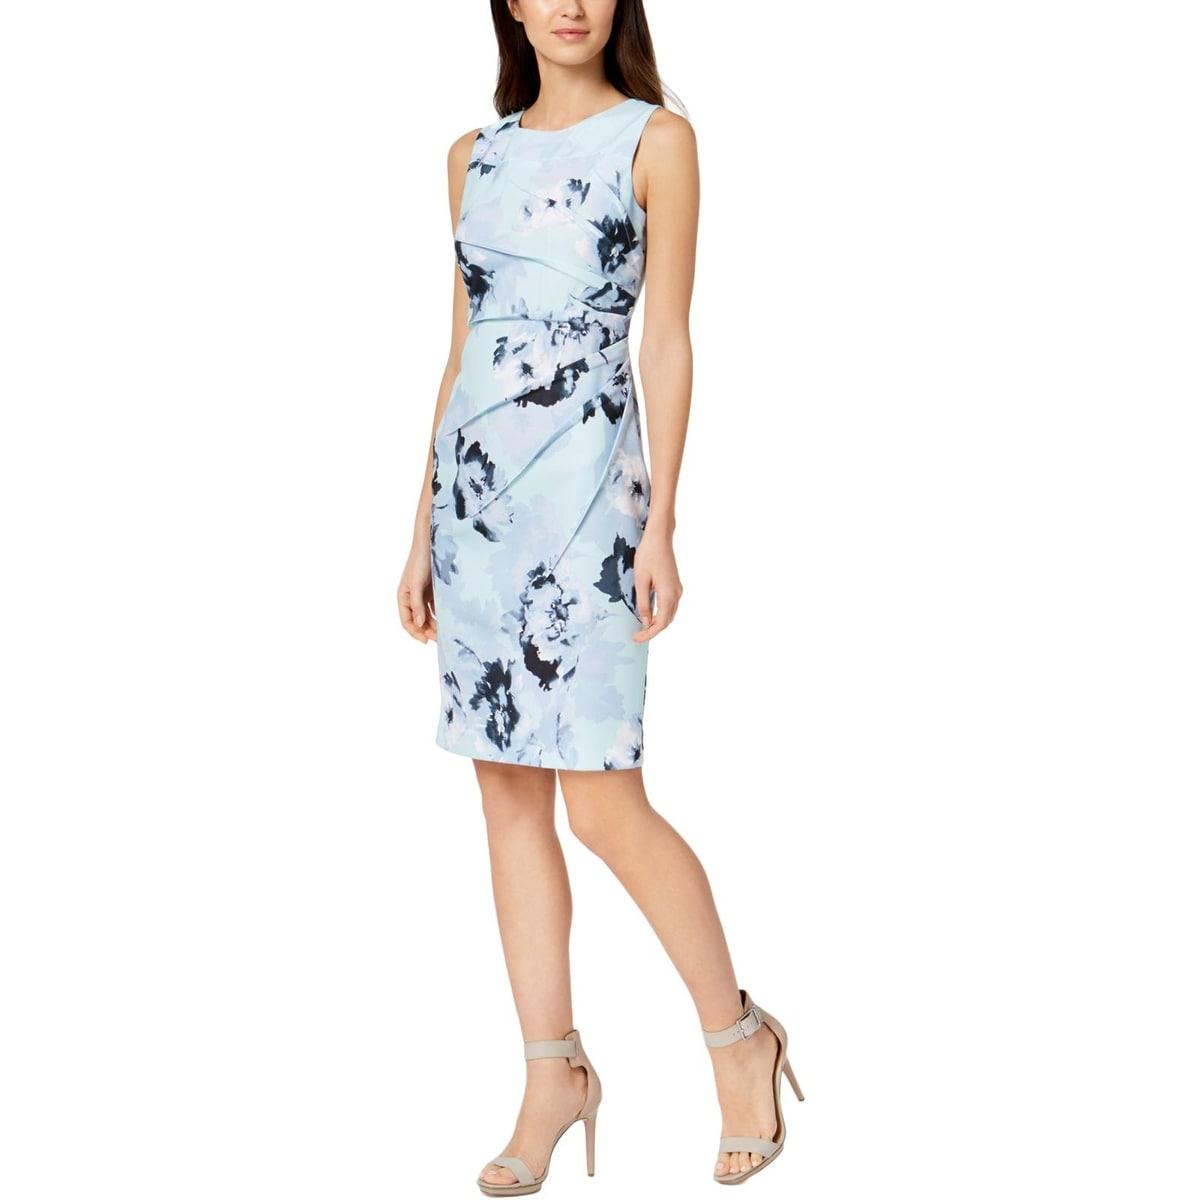 9b9b060d4bda2 Calvin Klein Dresses | Find Great Women's Clothing Deals Shopping at  Overstock